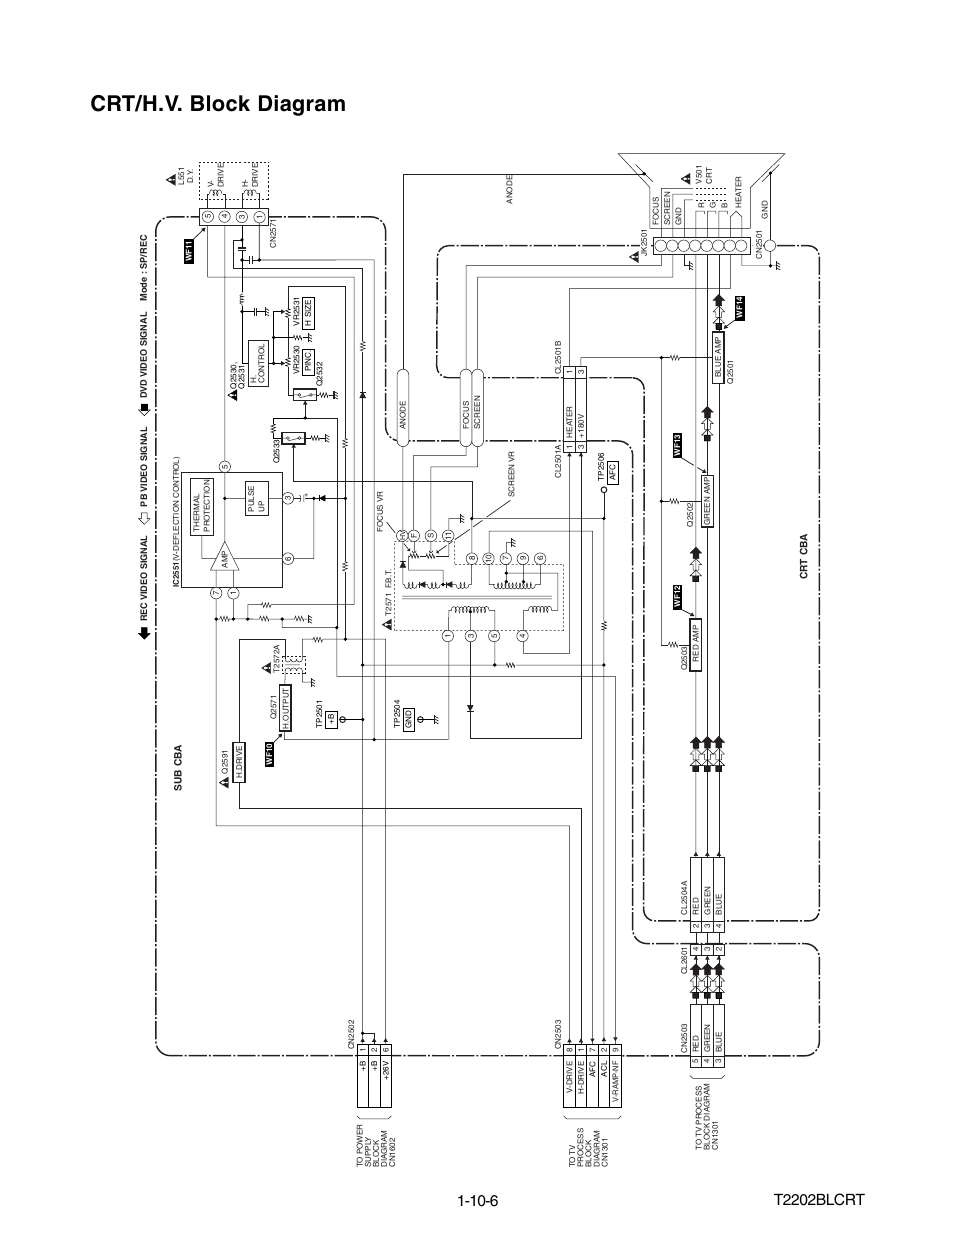 Crt/h.v. block diagram, T2202blcrt   Philips Magnavox ... on dvd vcr tv sound bar diagram, magnavox schematic tube, vip722k dvr connection diagram, magnavox receiver, 1920 s radio diagram, magnavox tube radio, crt tv wiring diagram, lg tv parts diagram, magnavox tv repair tips, magnavox amplifier, circuit diagram, magnavox stereo schematic, delco radio wiring diagram, magnavox am fm radio, magnavox portable radio, magnavox radio schematics, philips tv parts diagram, directv hook up diagram, rollerblade diagram,